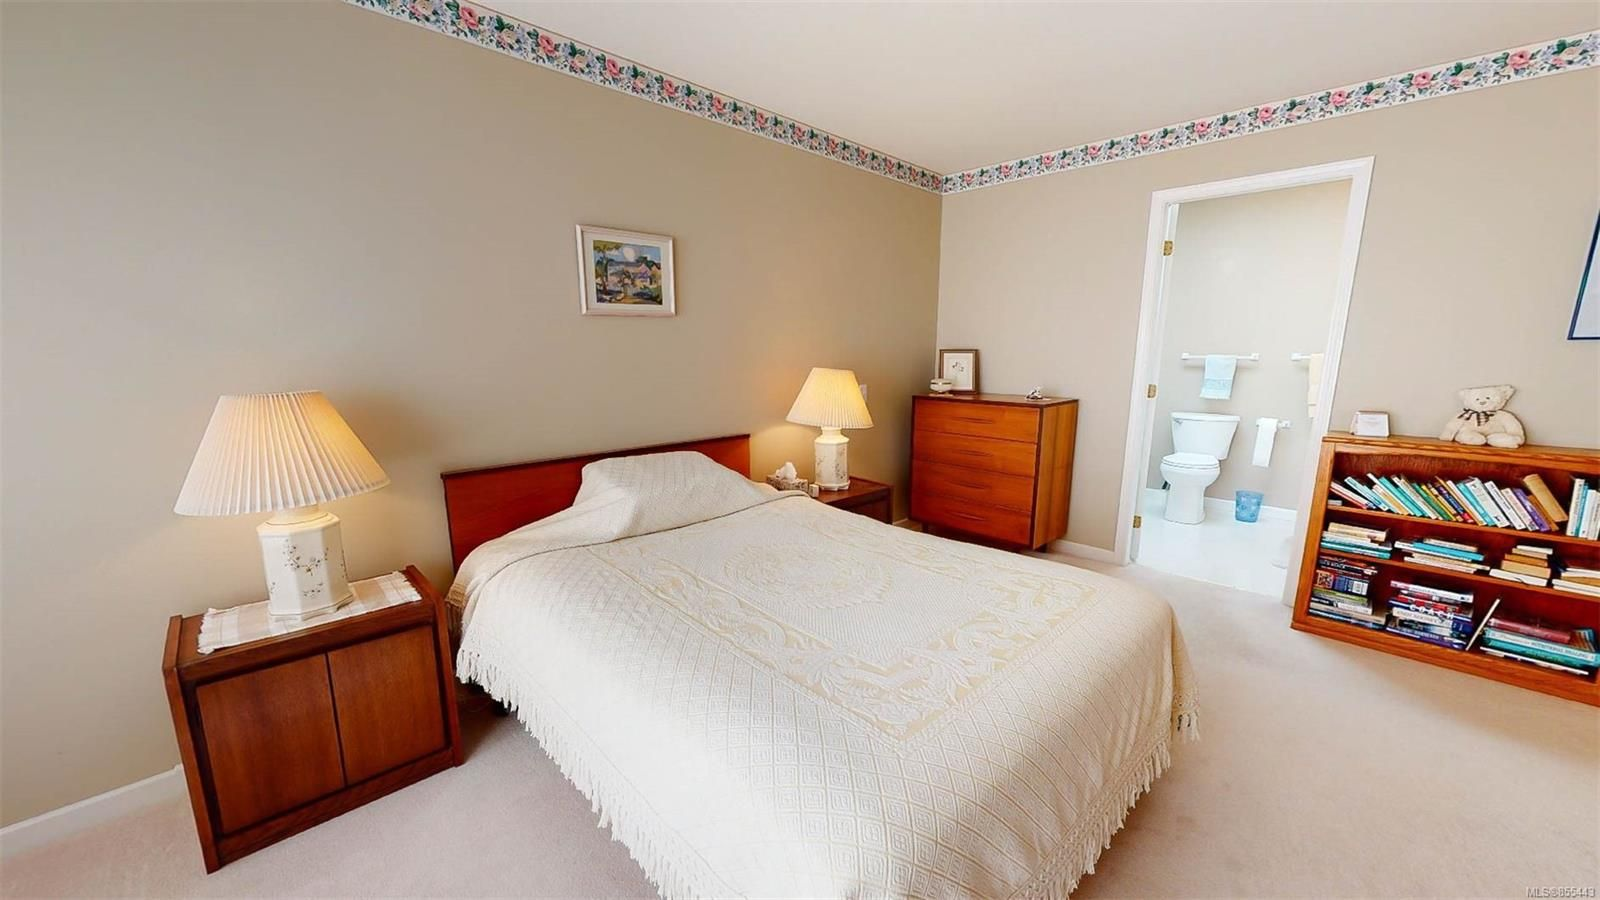 Photo 19: Photos: 1294 Leeward Way in : PQ Qualicum Beach House for sale (Parksville/Qualicum)  : MLS®# 855443